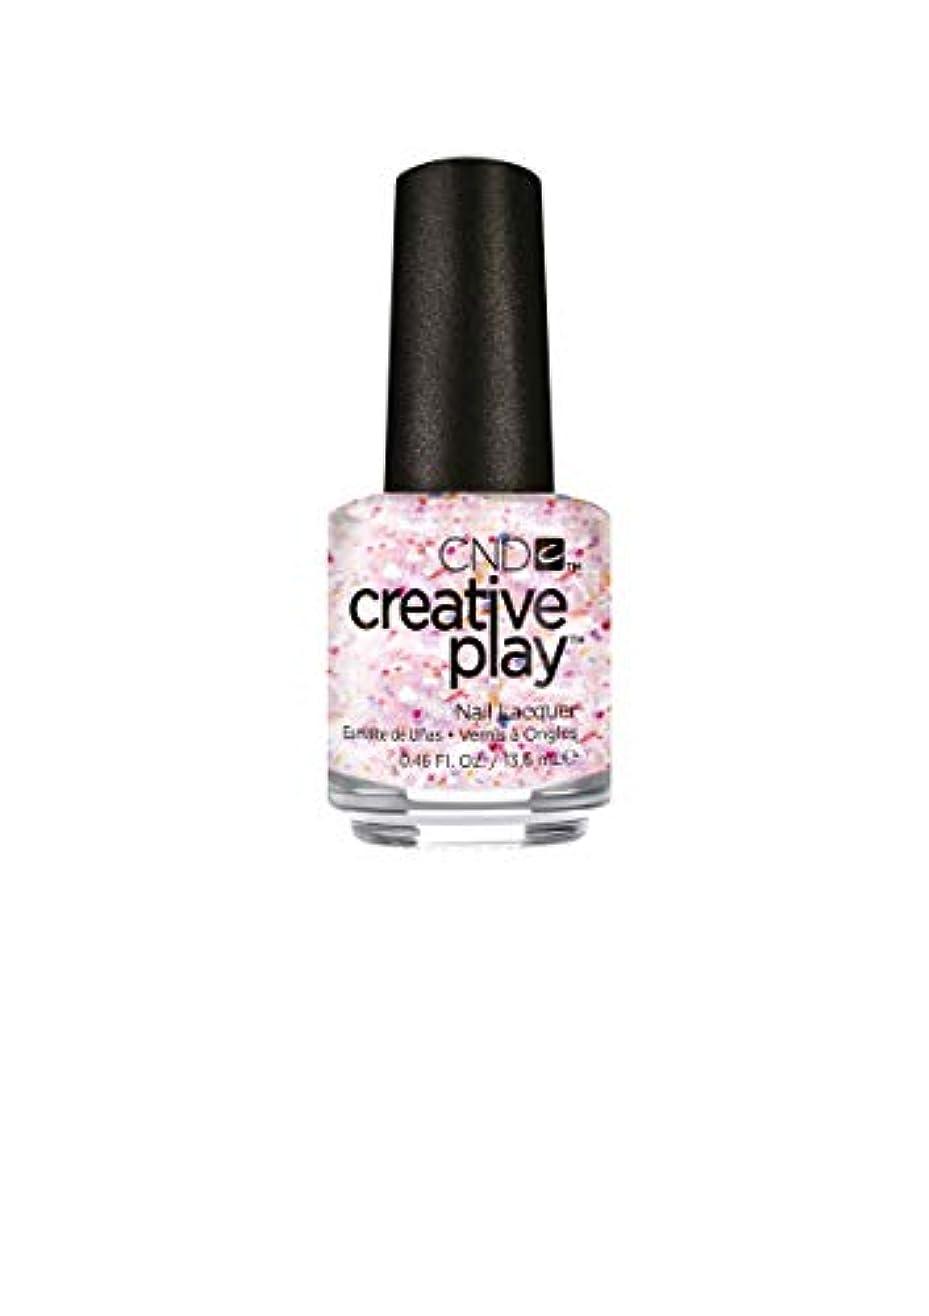 CND Creative Play Lacquer - Got a Light? - 0.46oz / 13.6ml